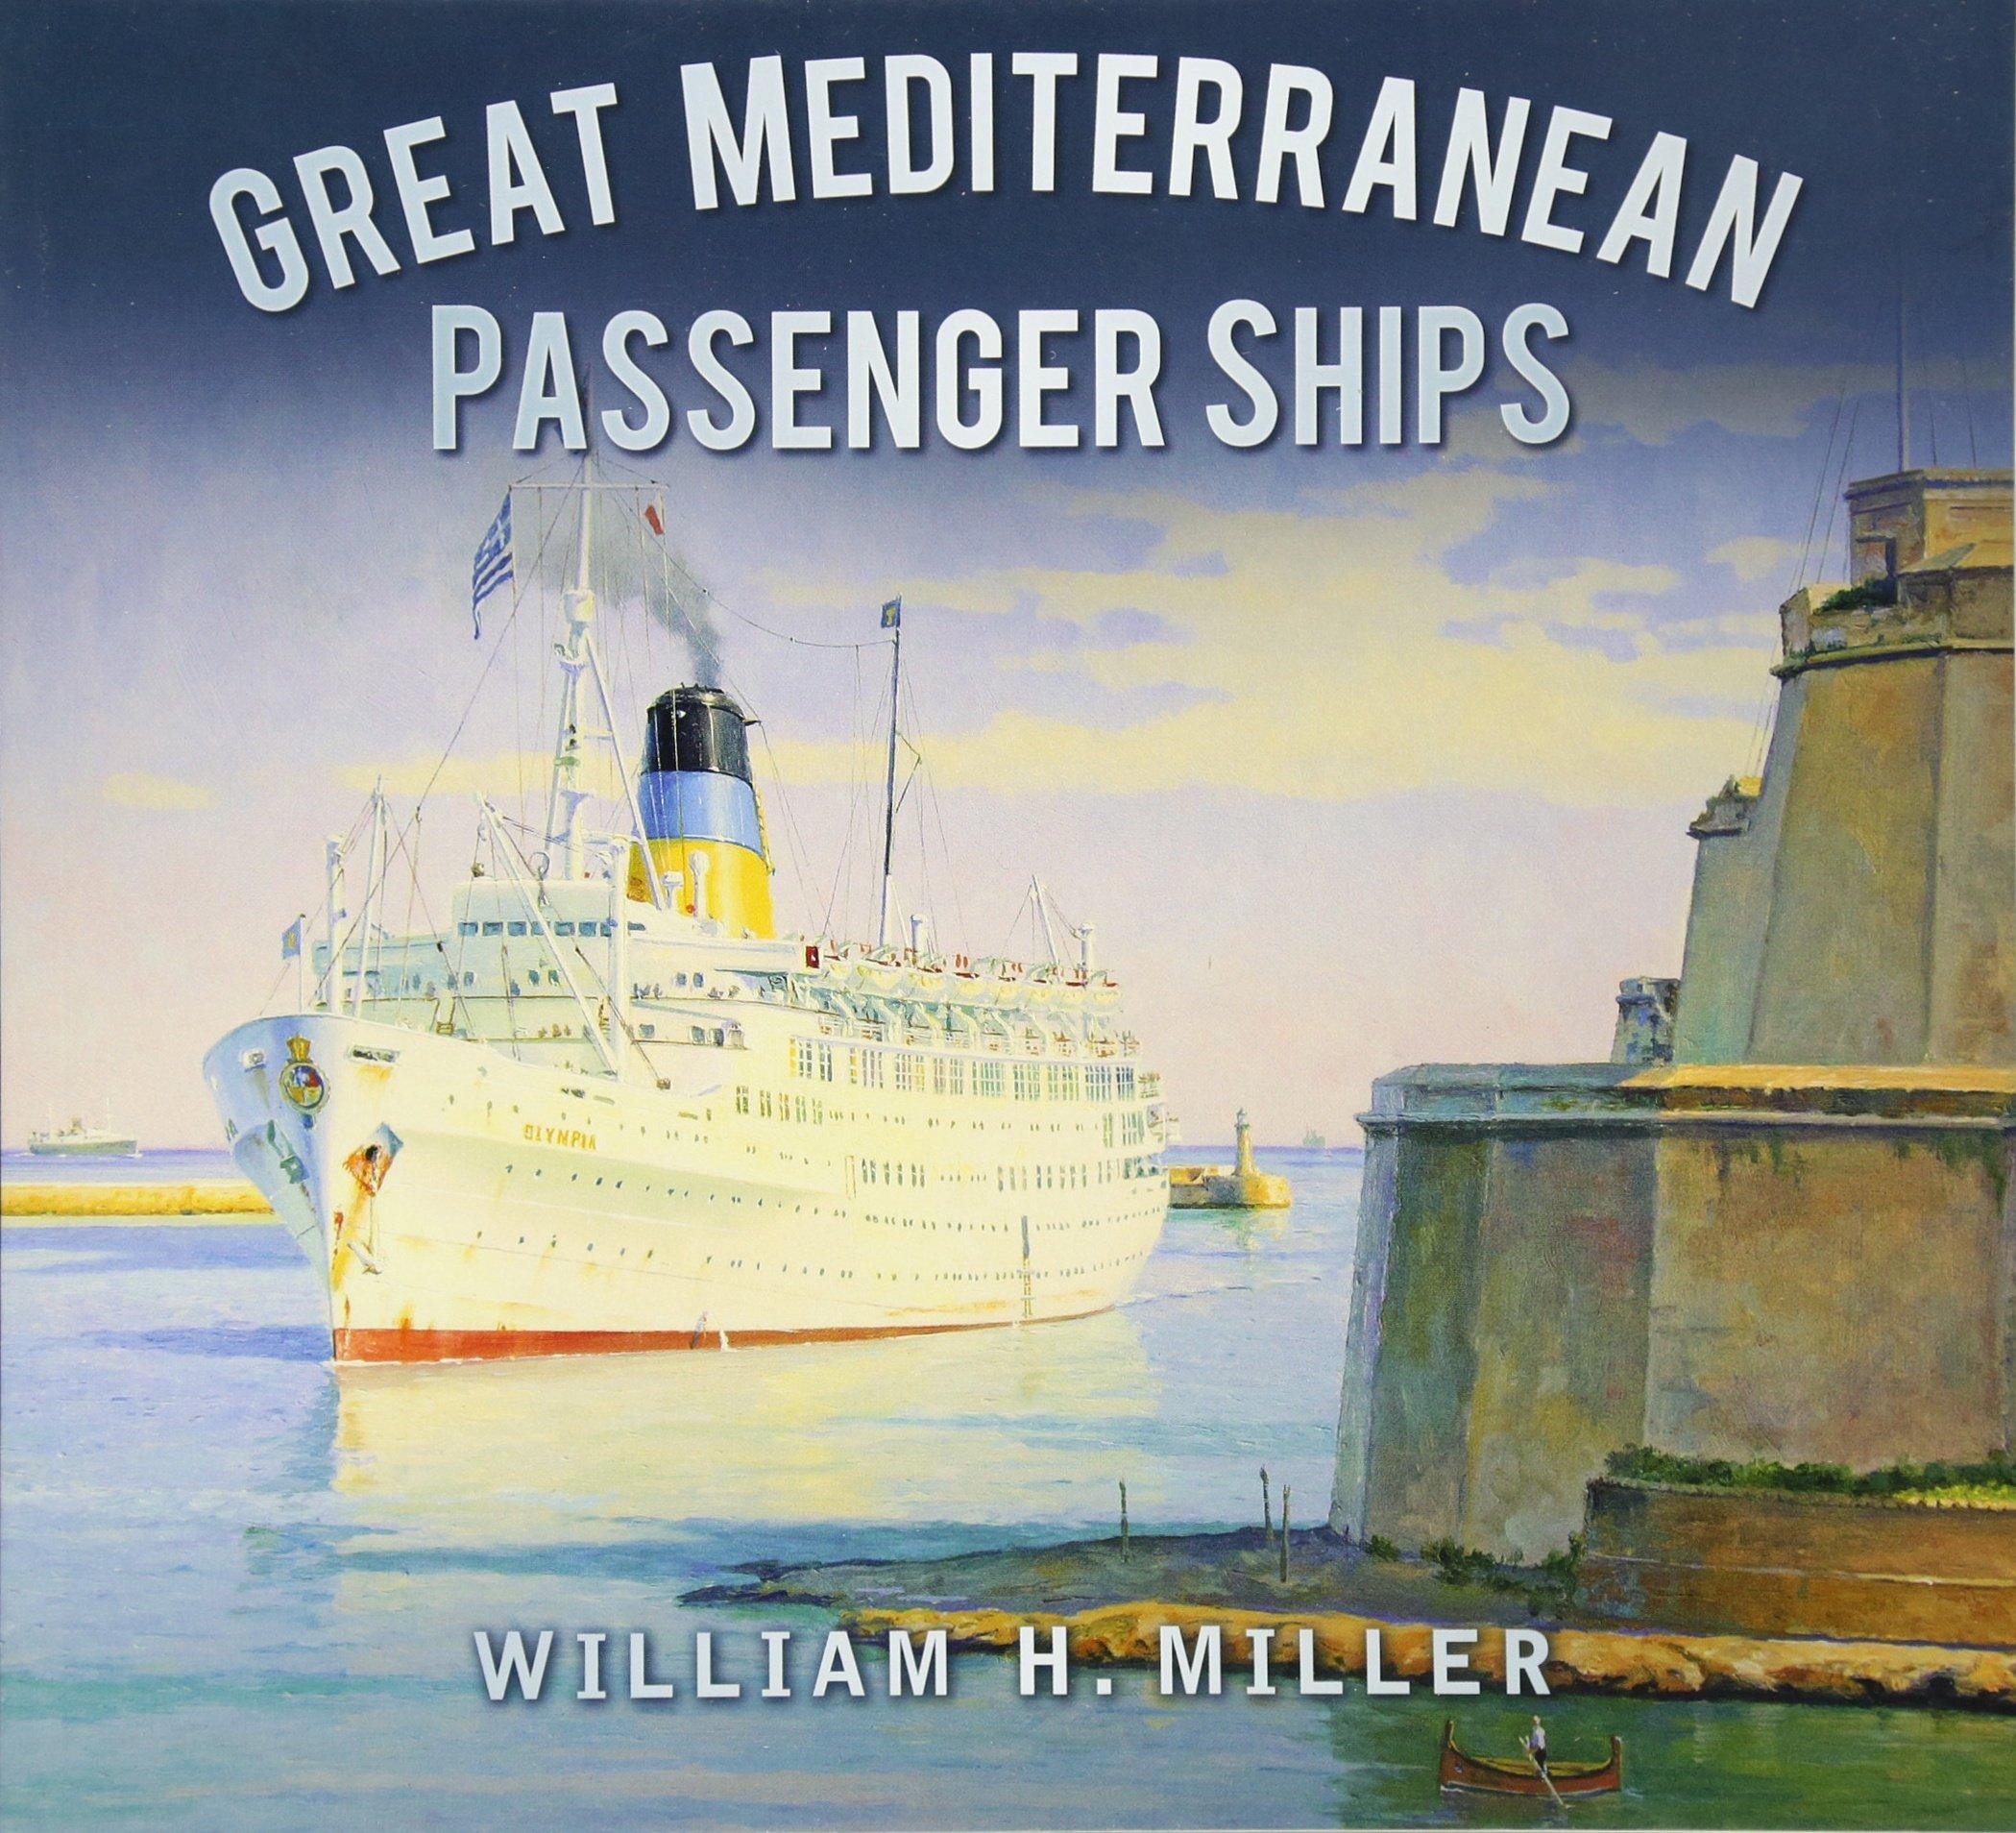 Great Mediterranean Passenger Ships (Great Passenger Ships)